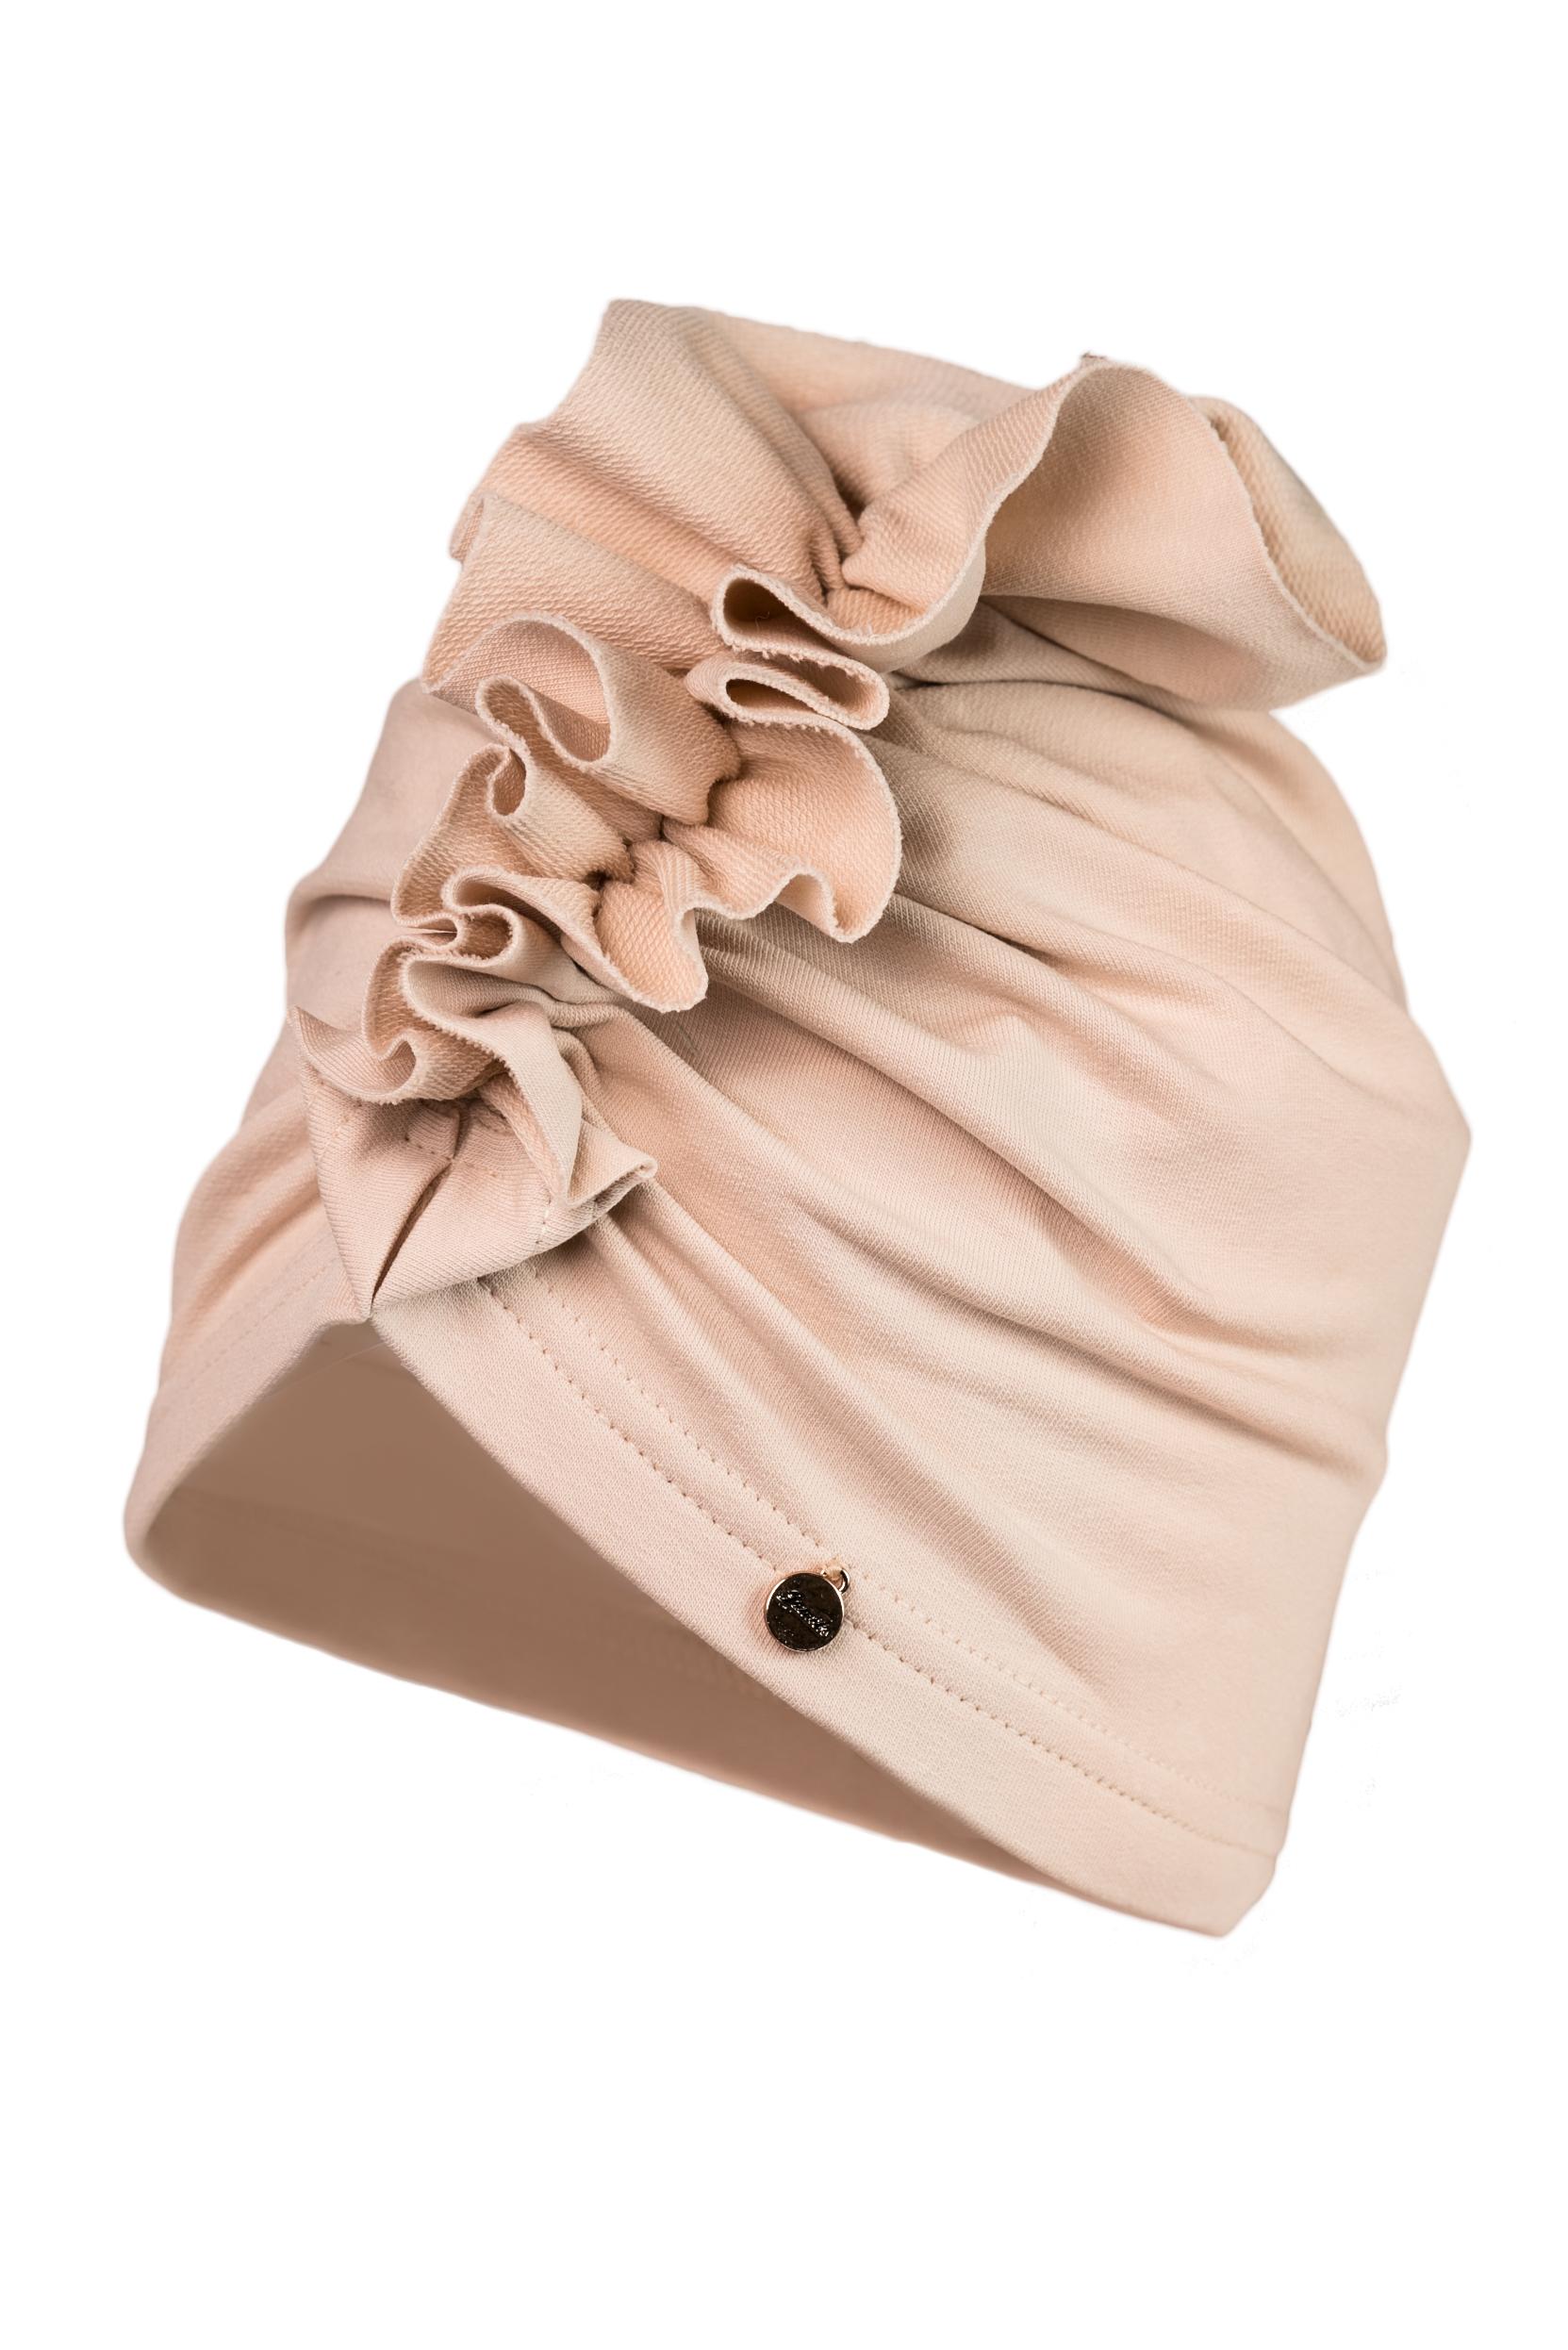 LANDONA turban 1